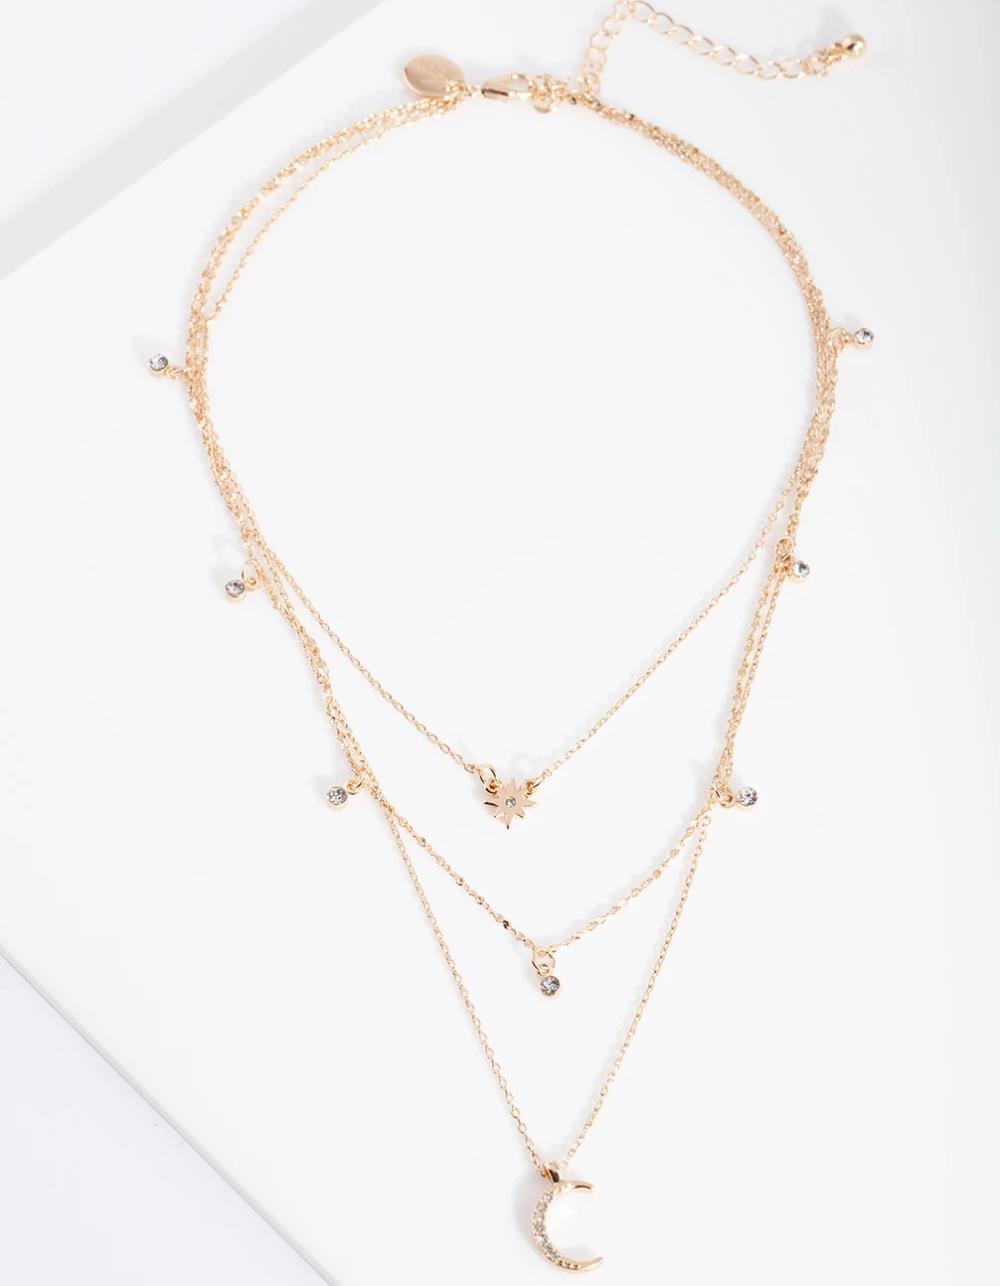 Gold Celestial Diamante Layered Necklace Lovisa Jewellery Celestial Jewelry Layered Necklaces